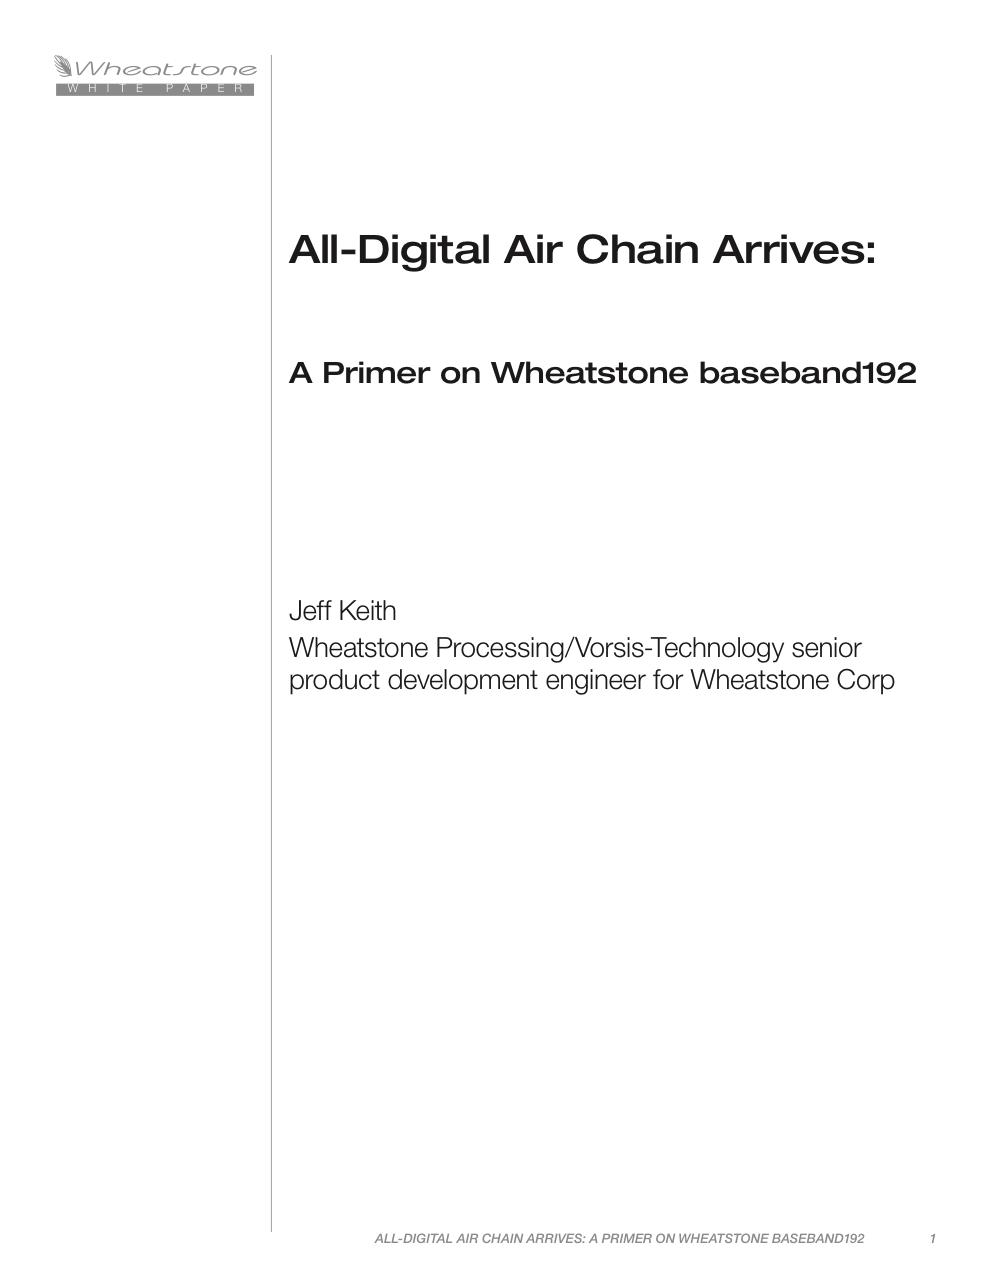 Wheatstone Baseband 192 White Paper